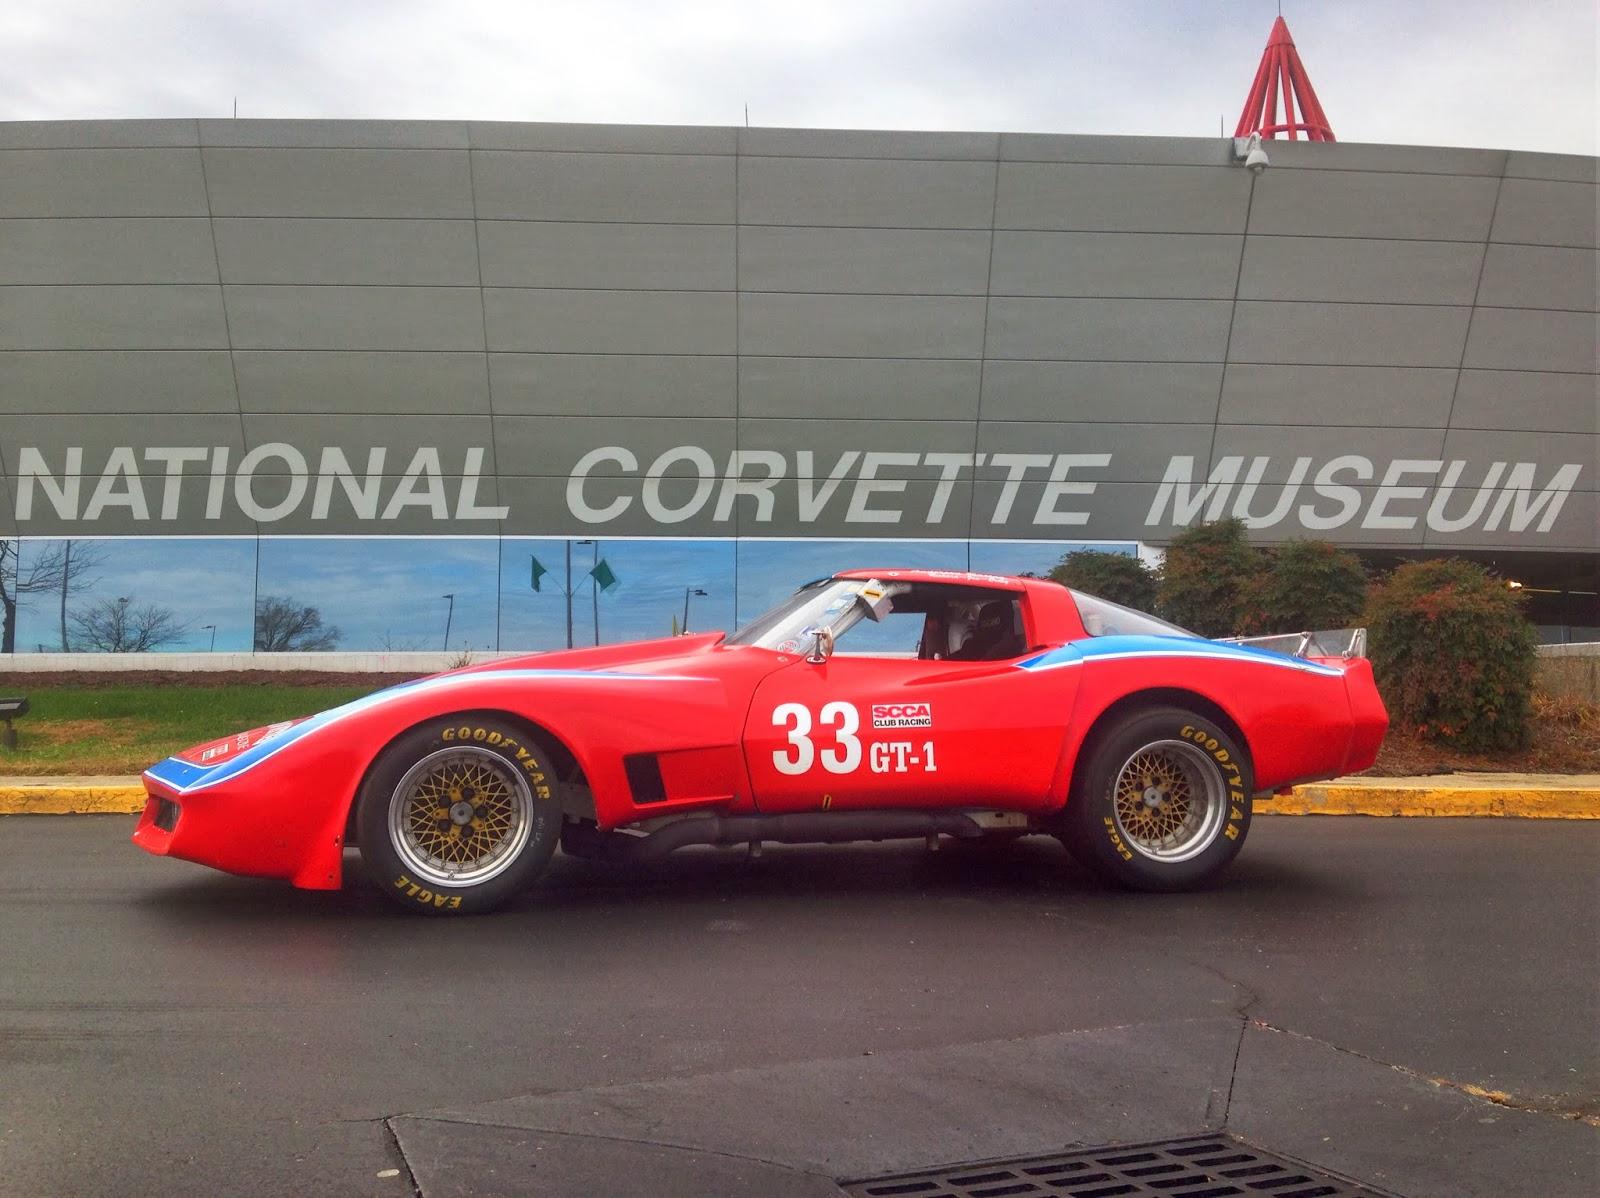 national corvette museum richard anderson donates race car. Cars Review. Best American Auto & Cars Review